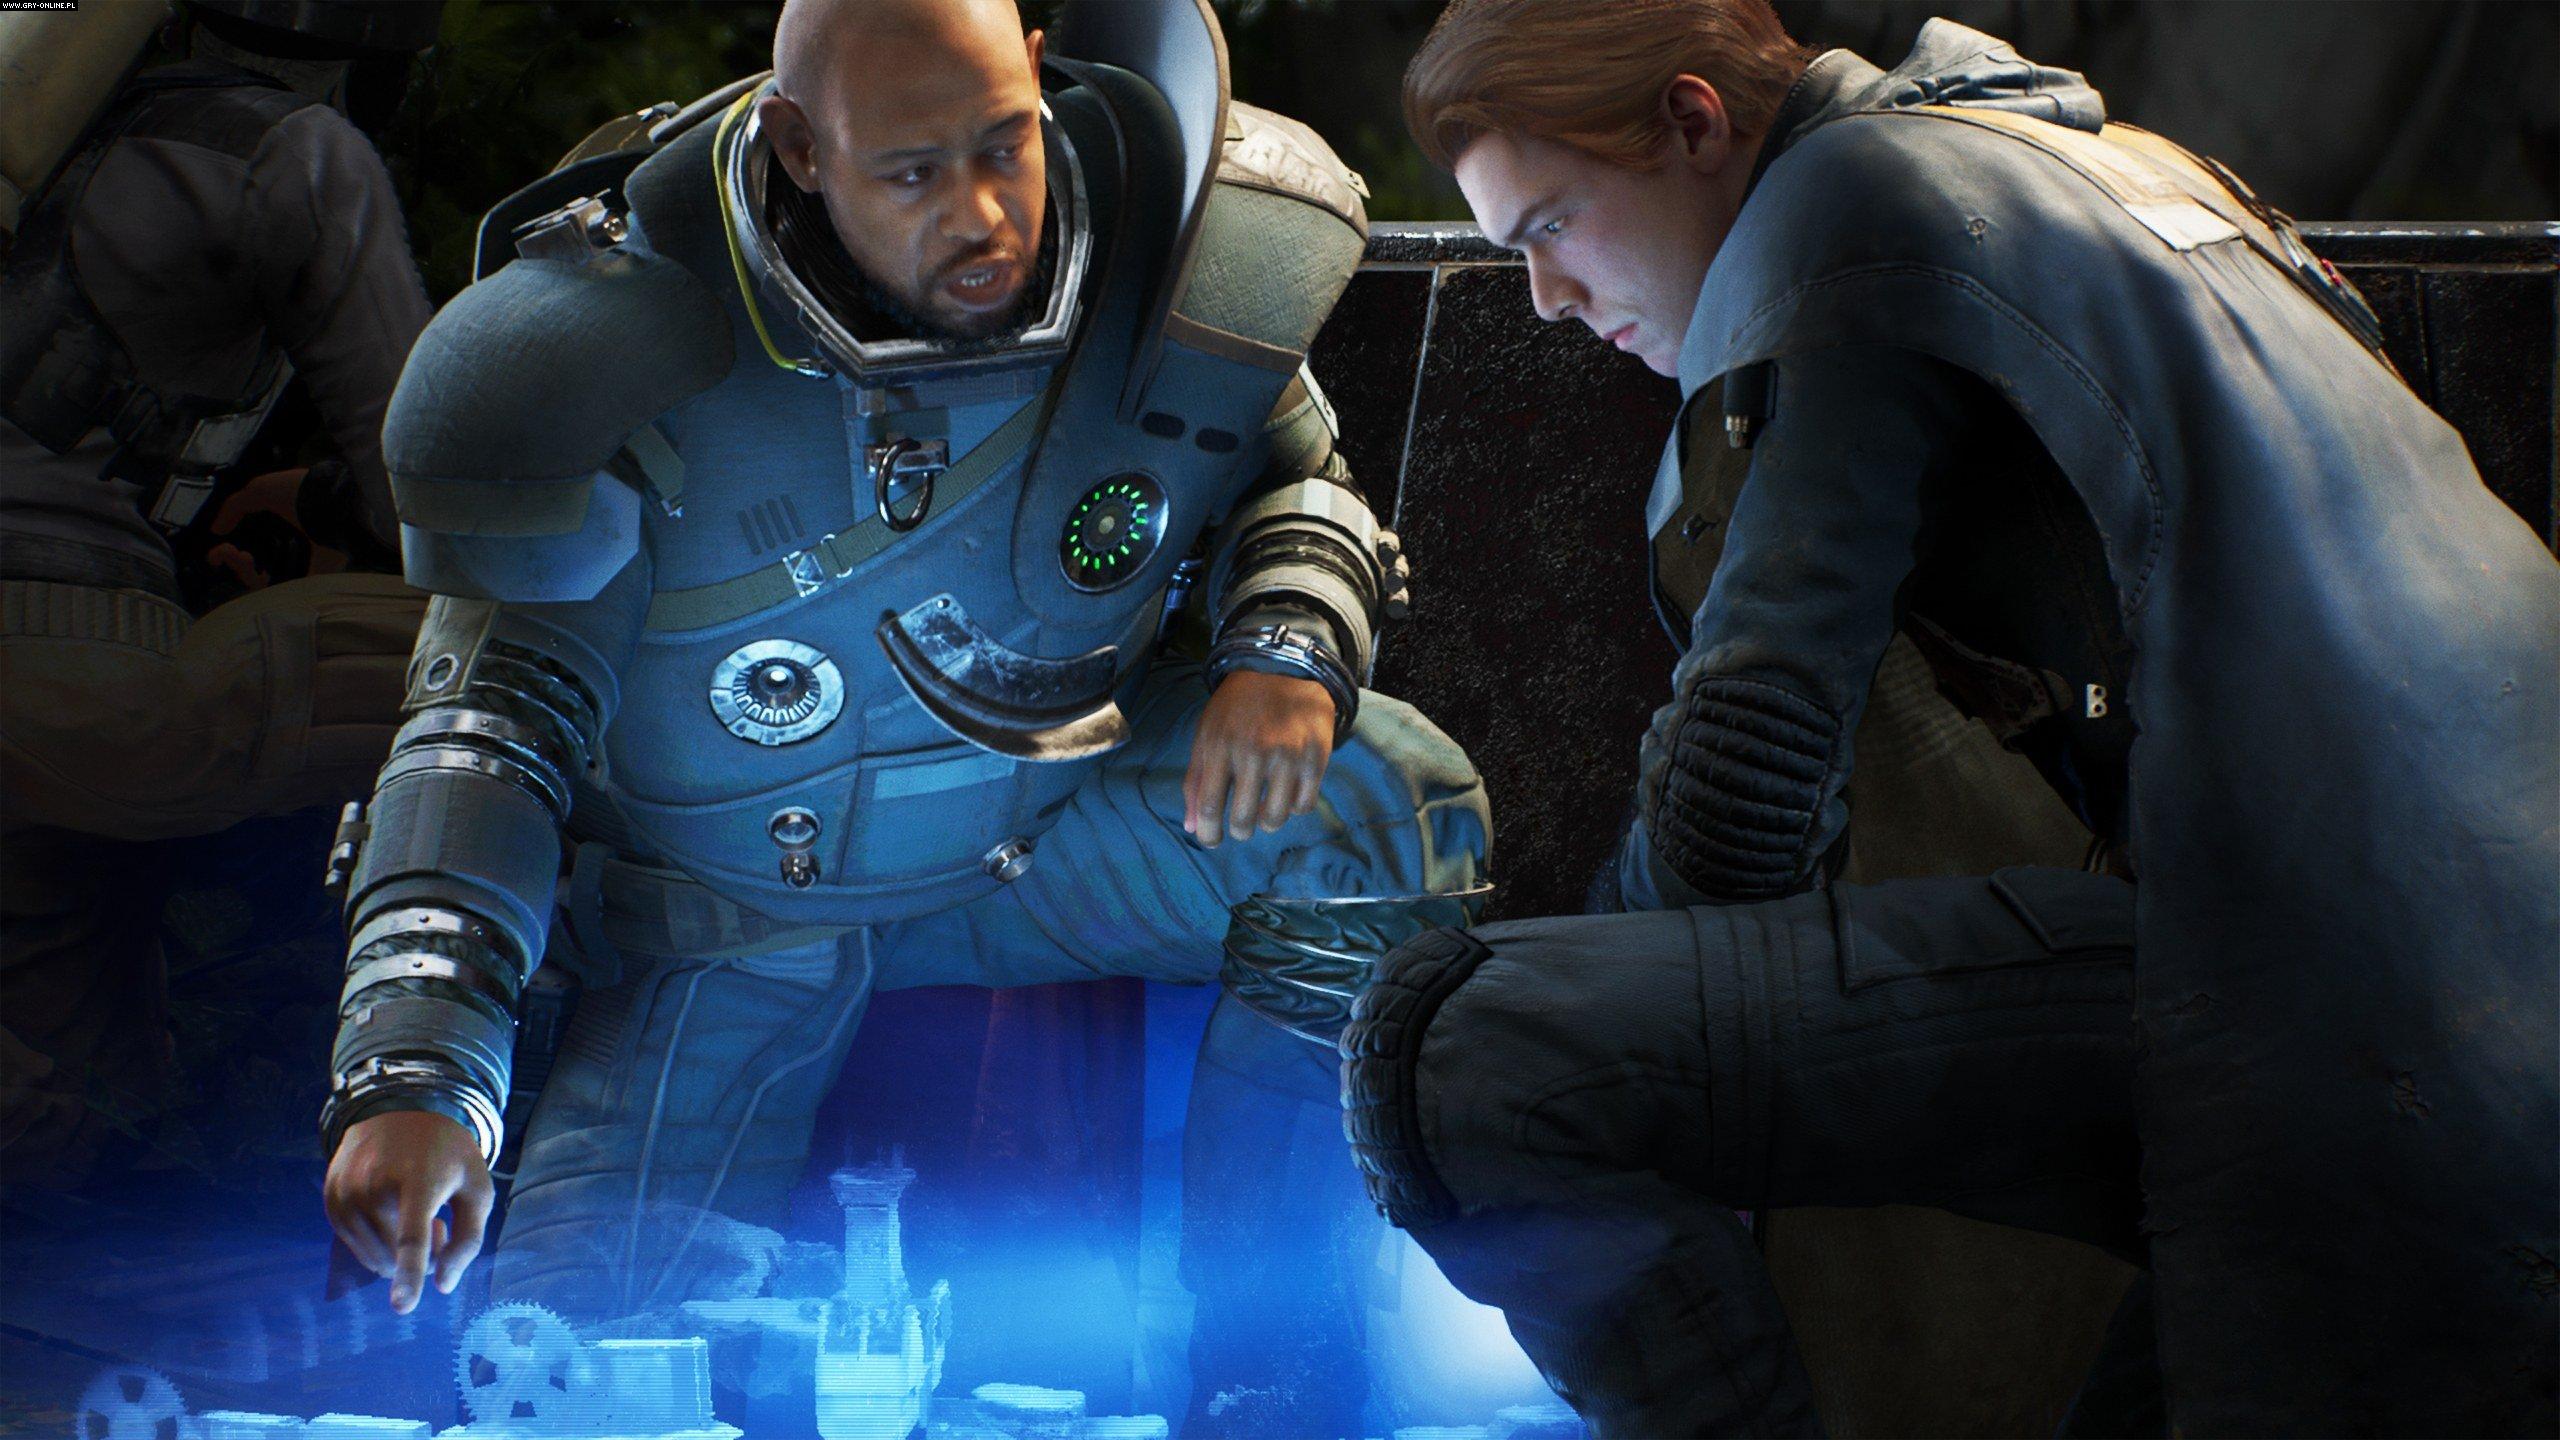 Star Wars Jedi: Fallen Order PC, PS4, XONE Games Image 3/24, Respawn Entertainment, Electronic Arts Inc.